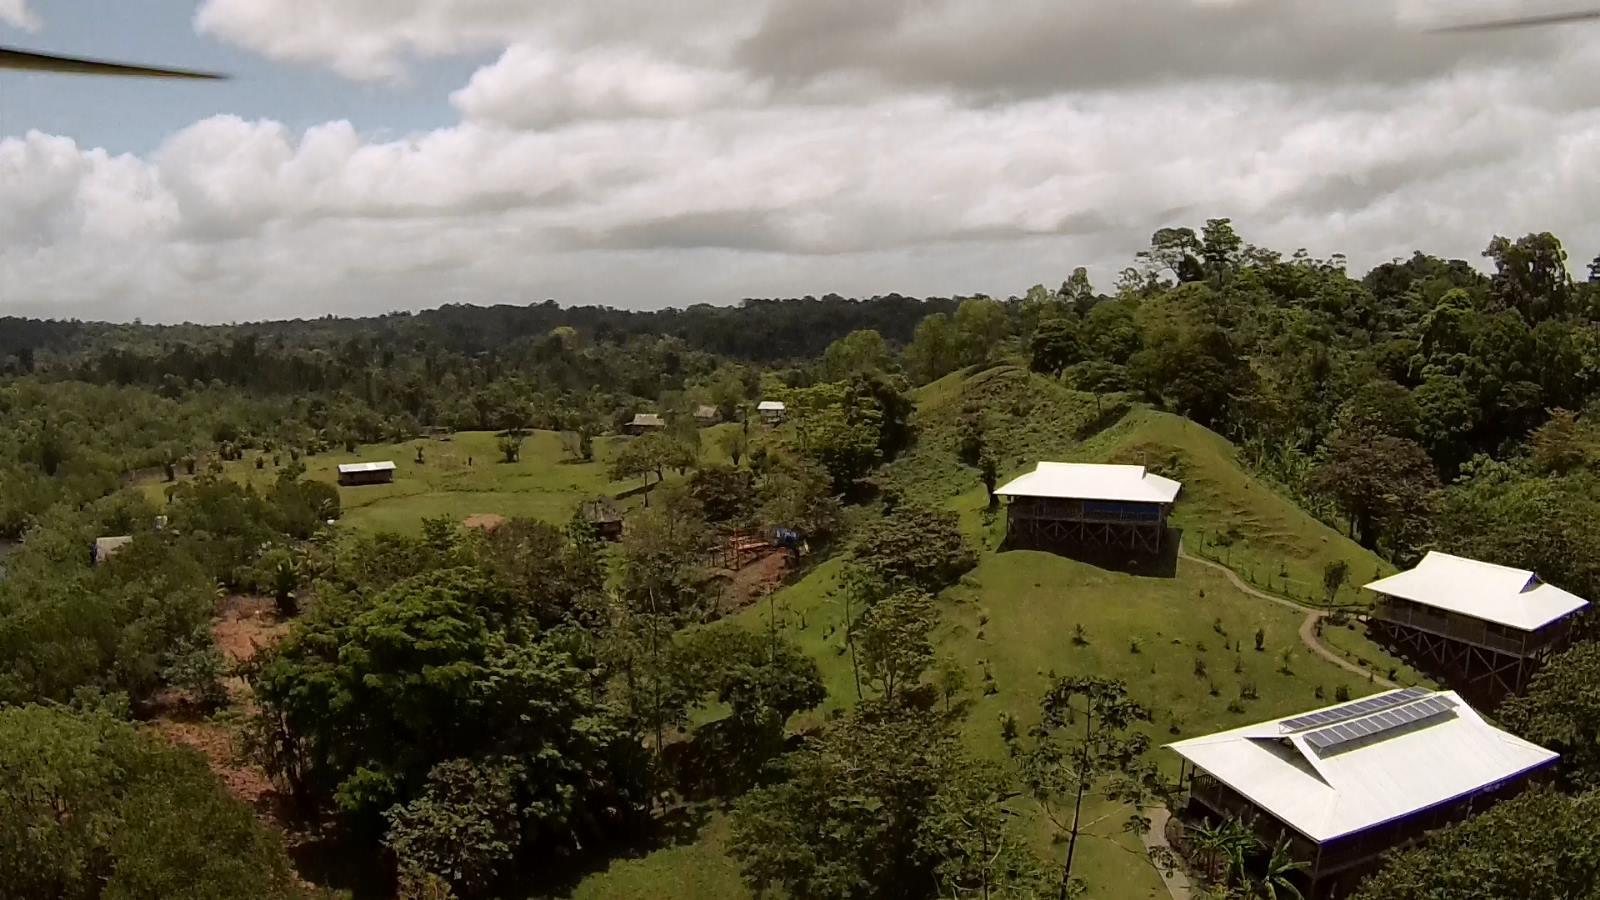 Shirlene's home in Panama